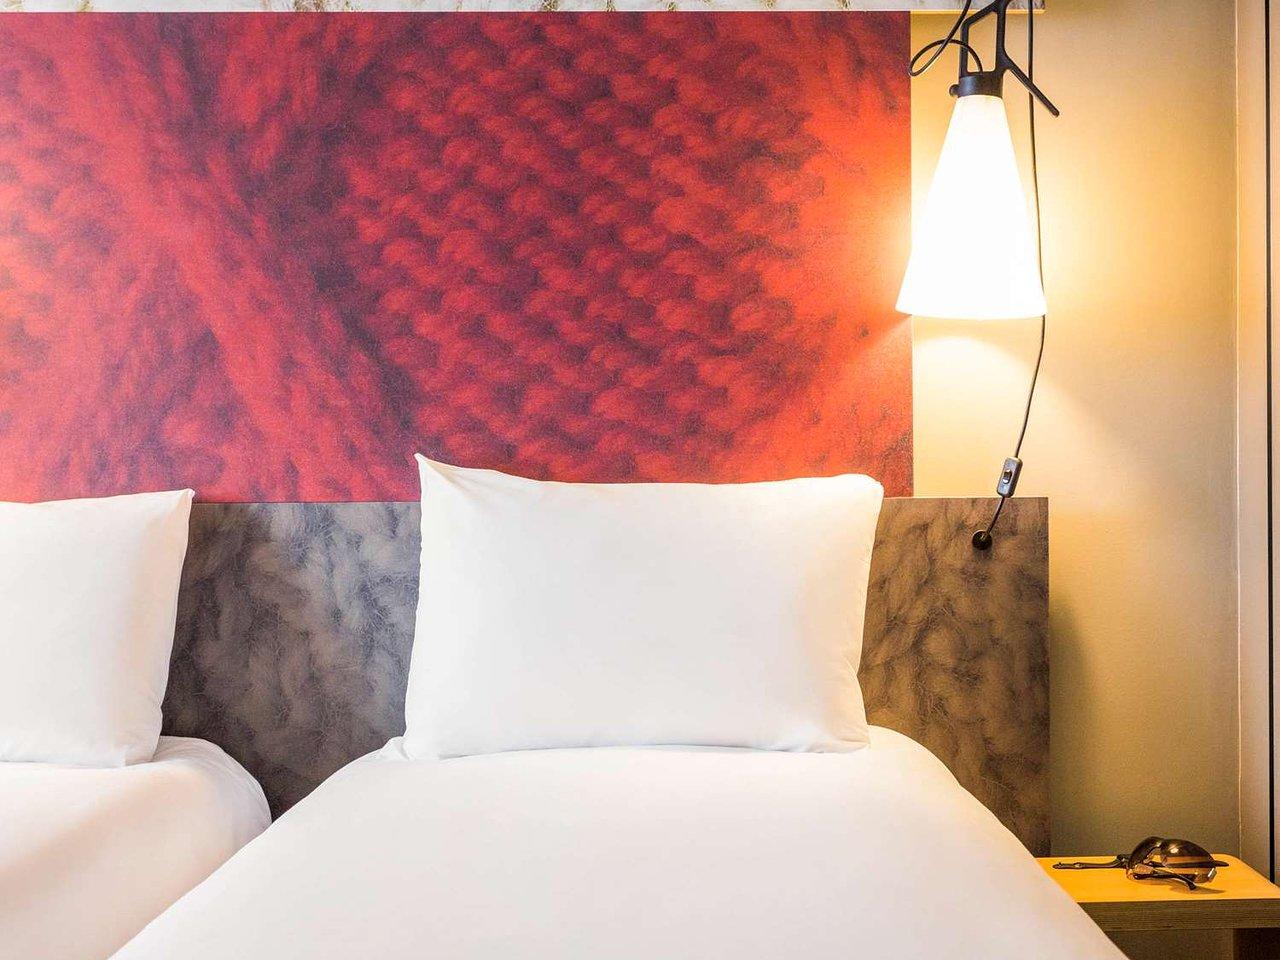 ibis paris gare du nord la fayette updated 2019 prices hotel rh tripadvisor co uk